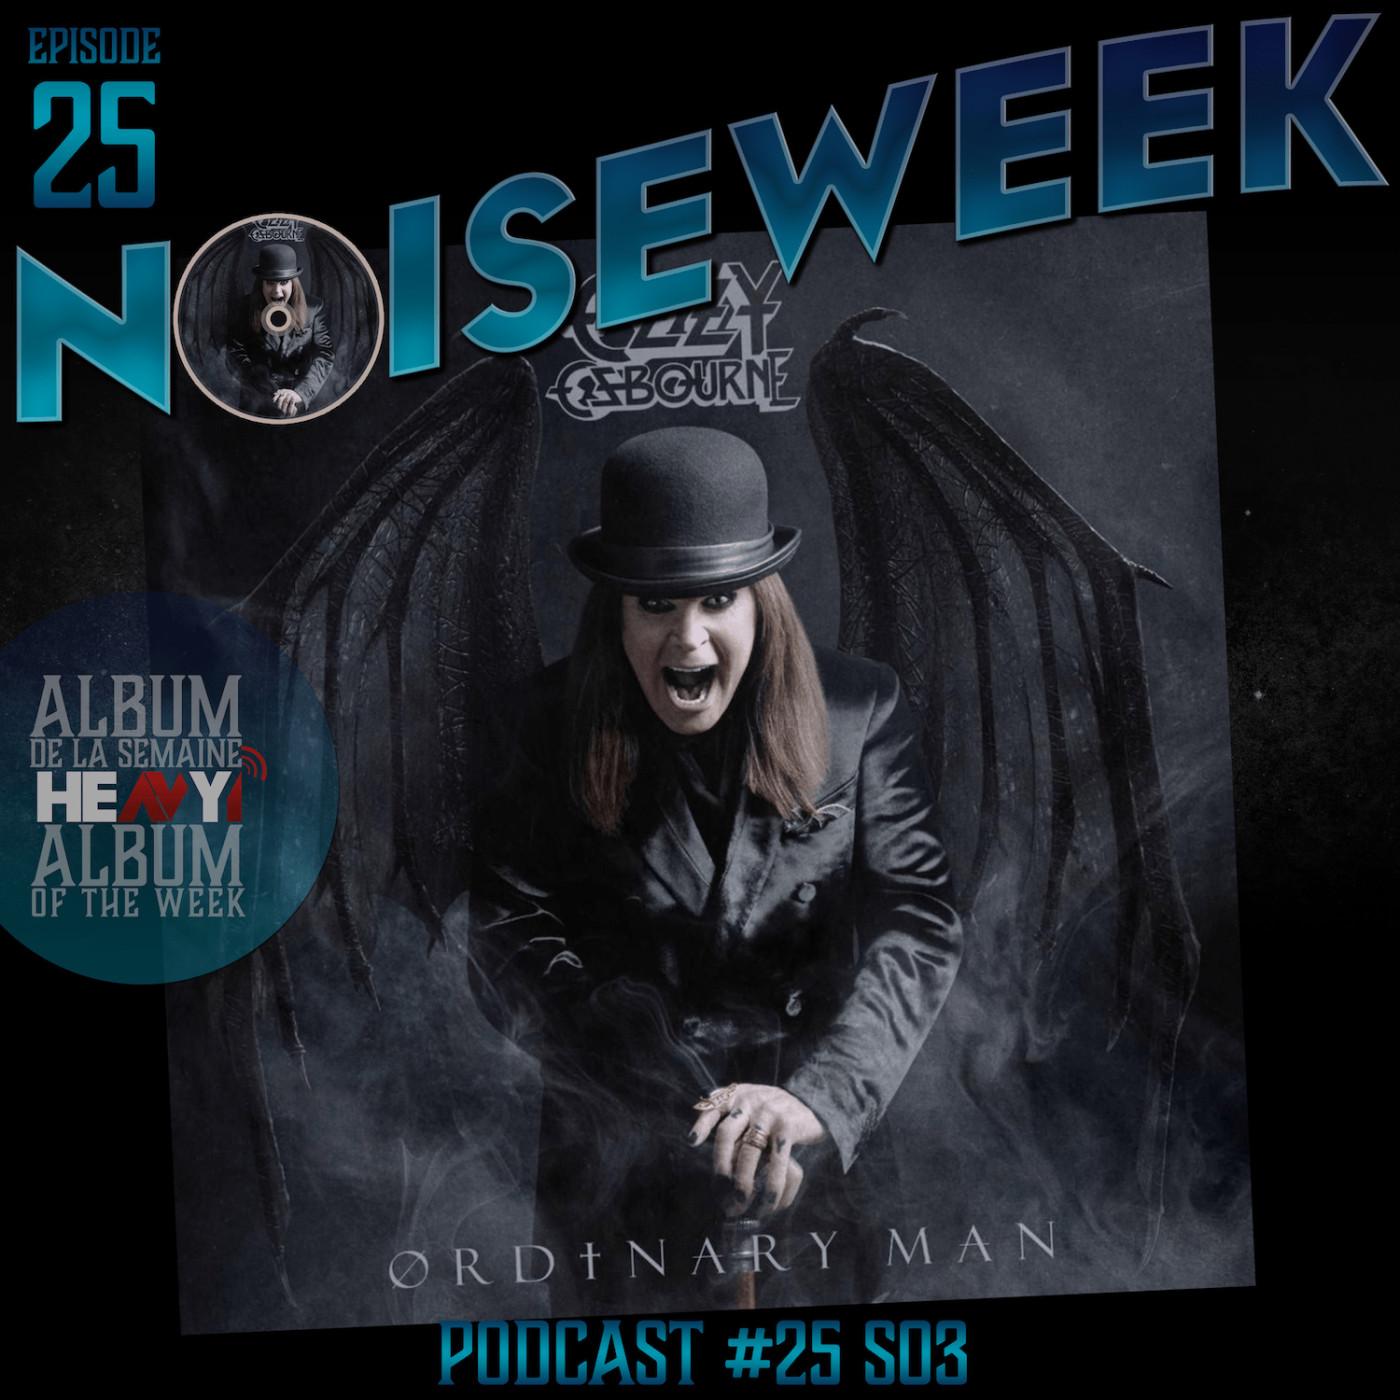 Noiseweek #25 Saison 3